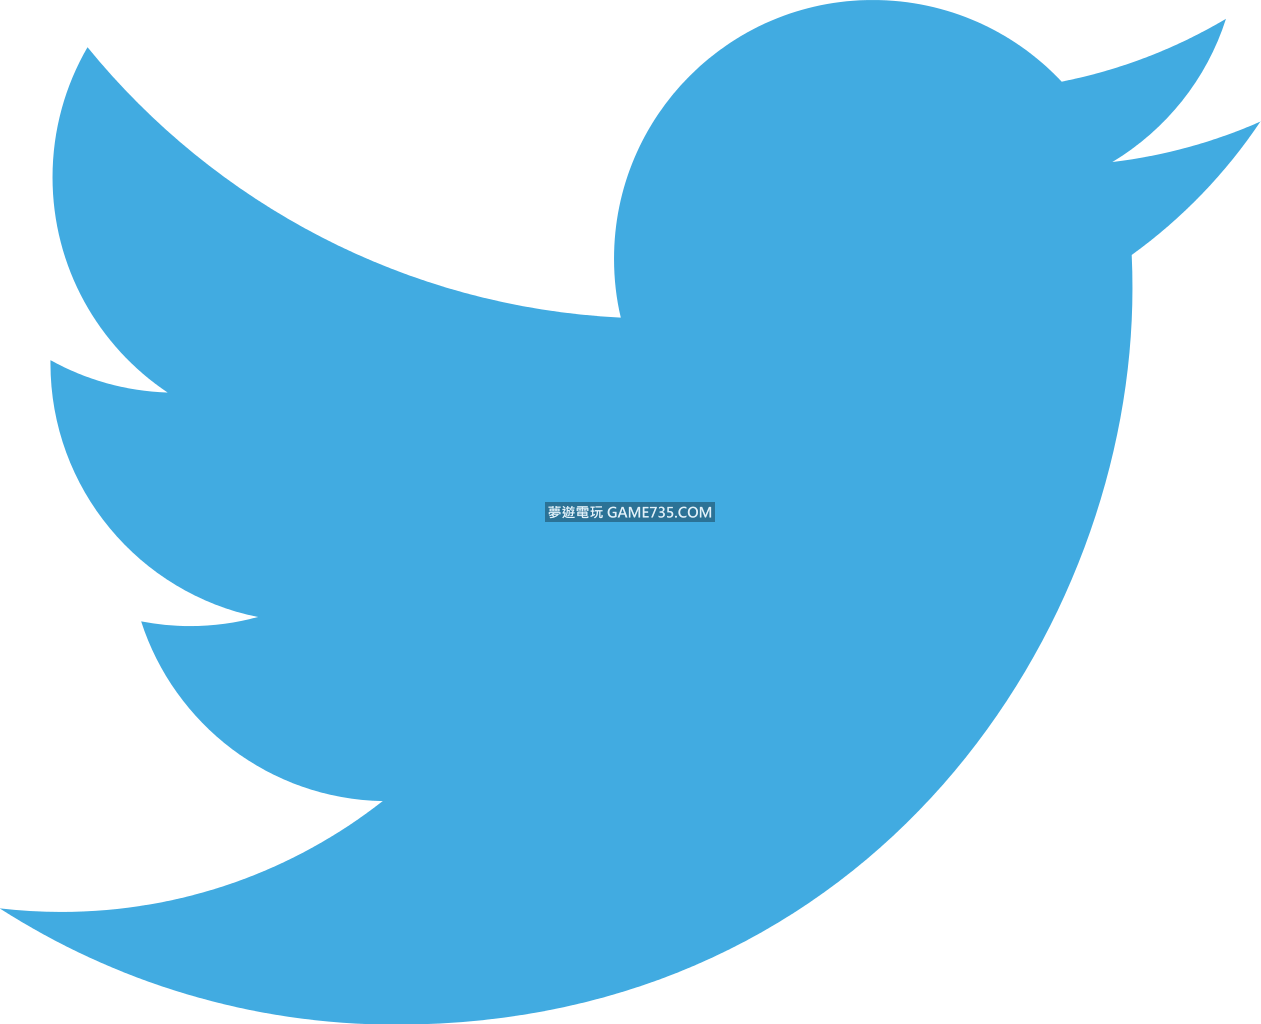 1261px-Twitter_bird_logo_2012.svg.jpg